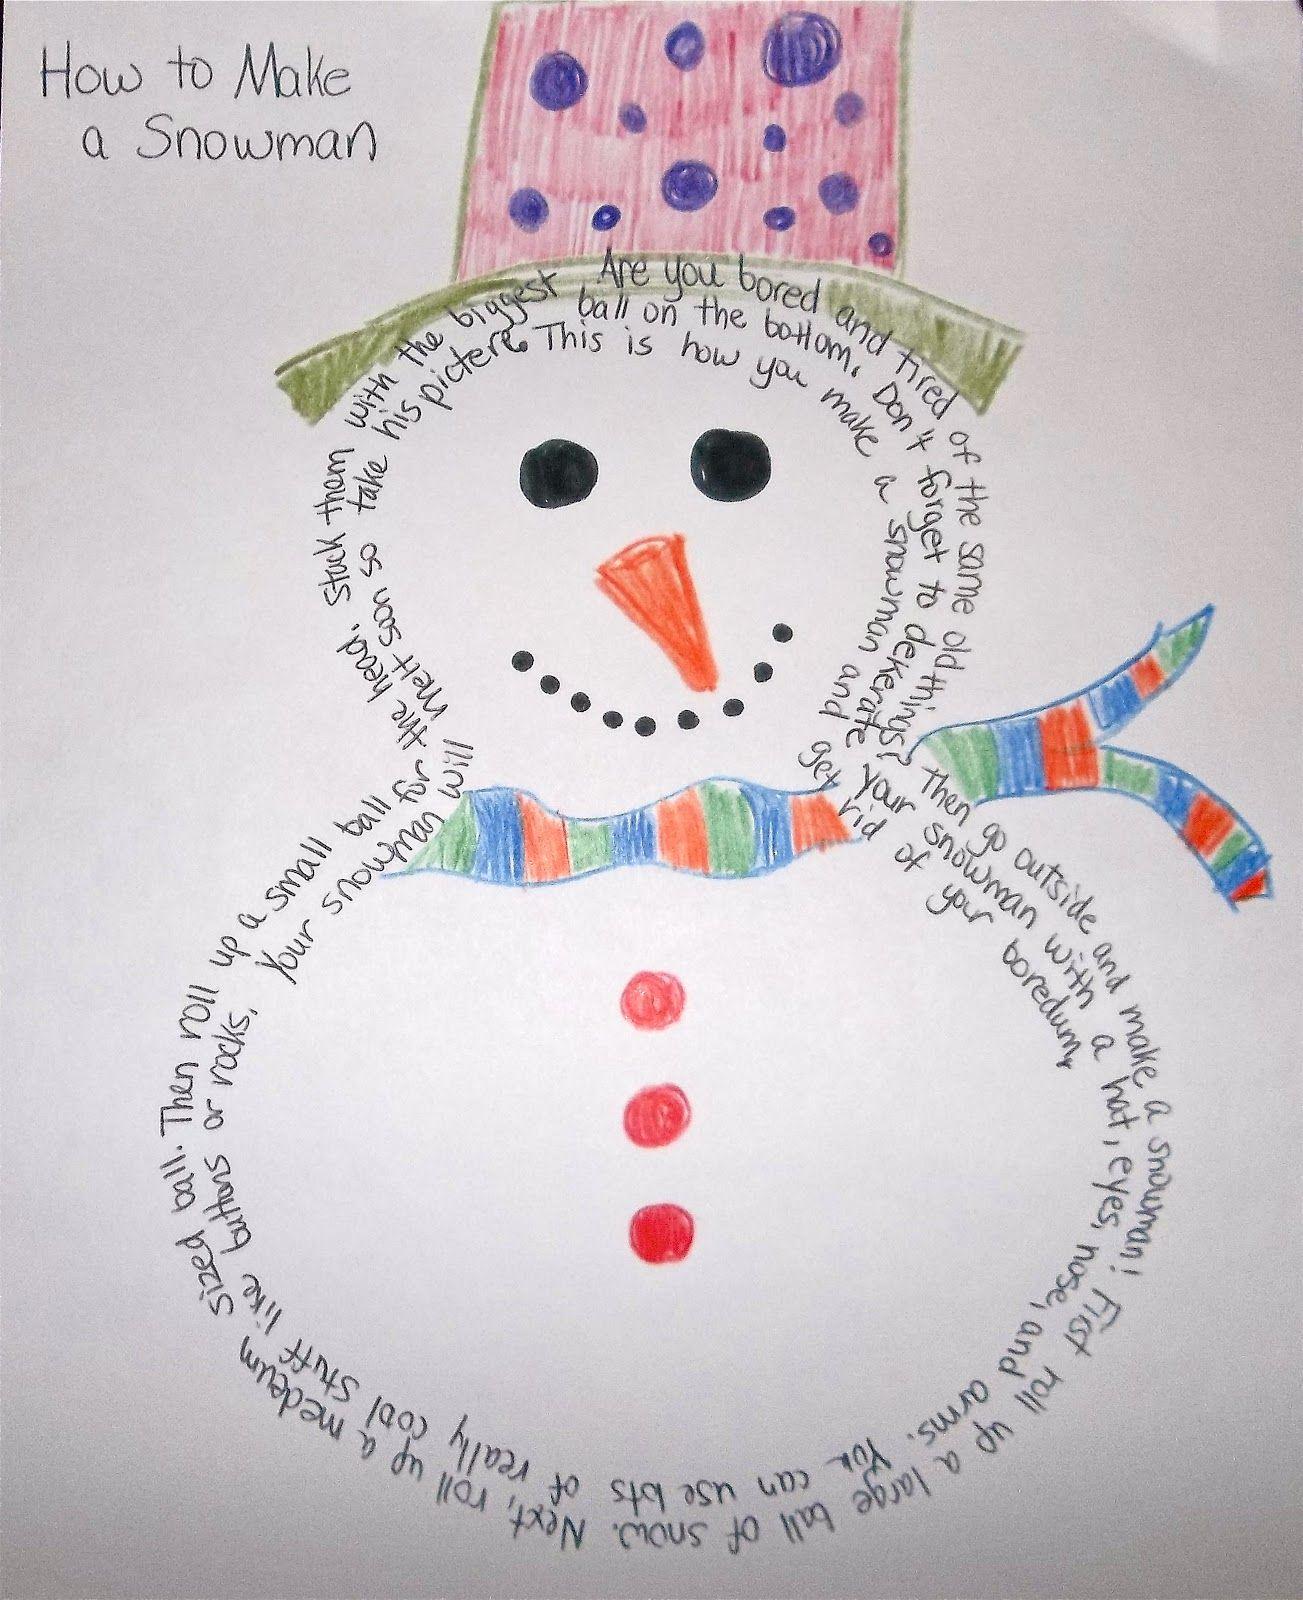 Figurative Language Concrete Poetry Snowman Example